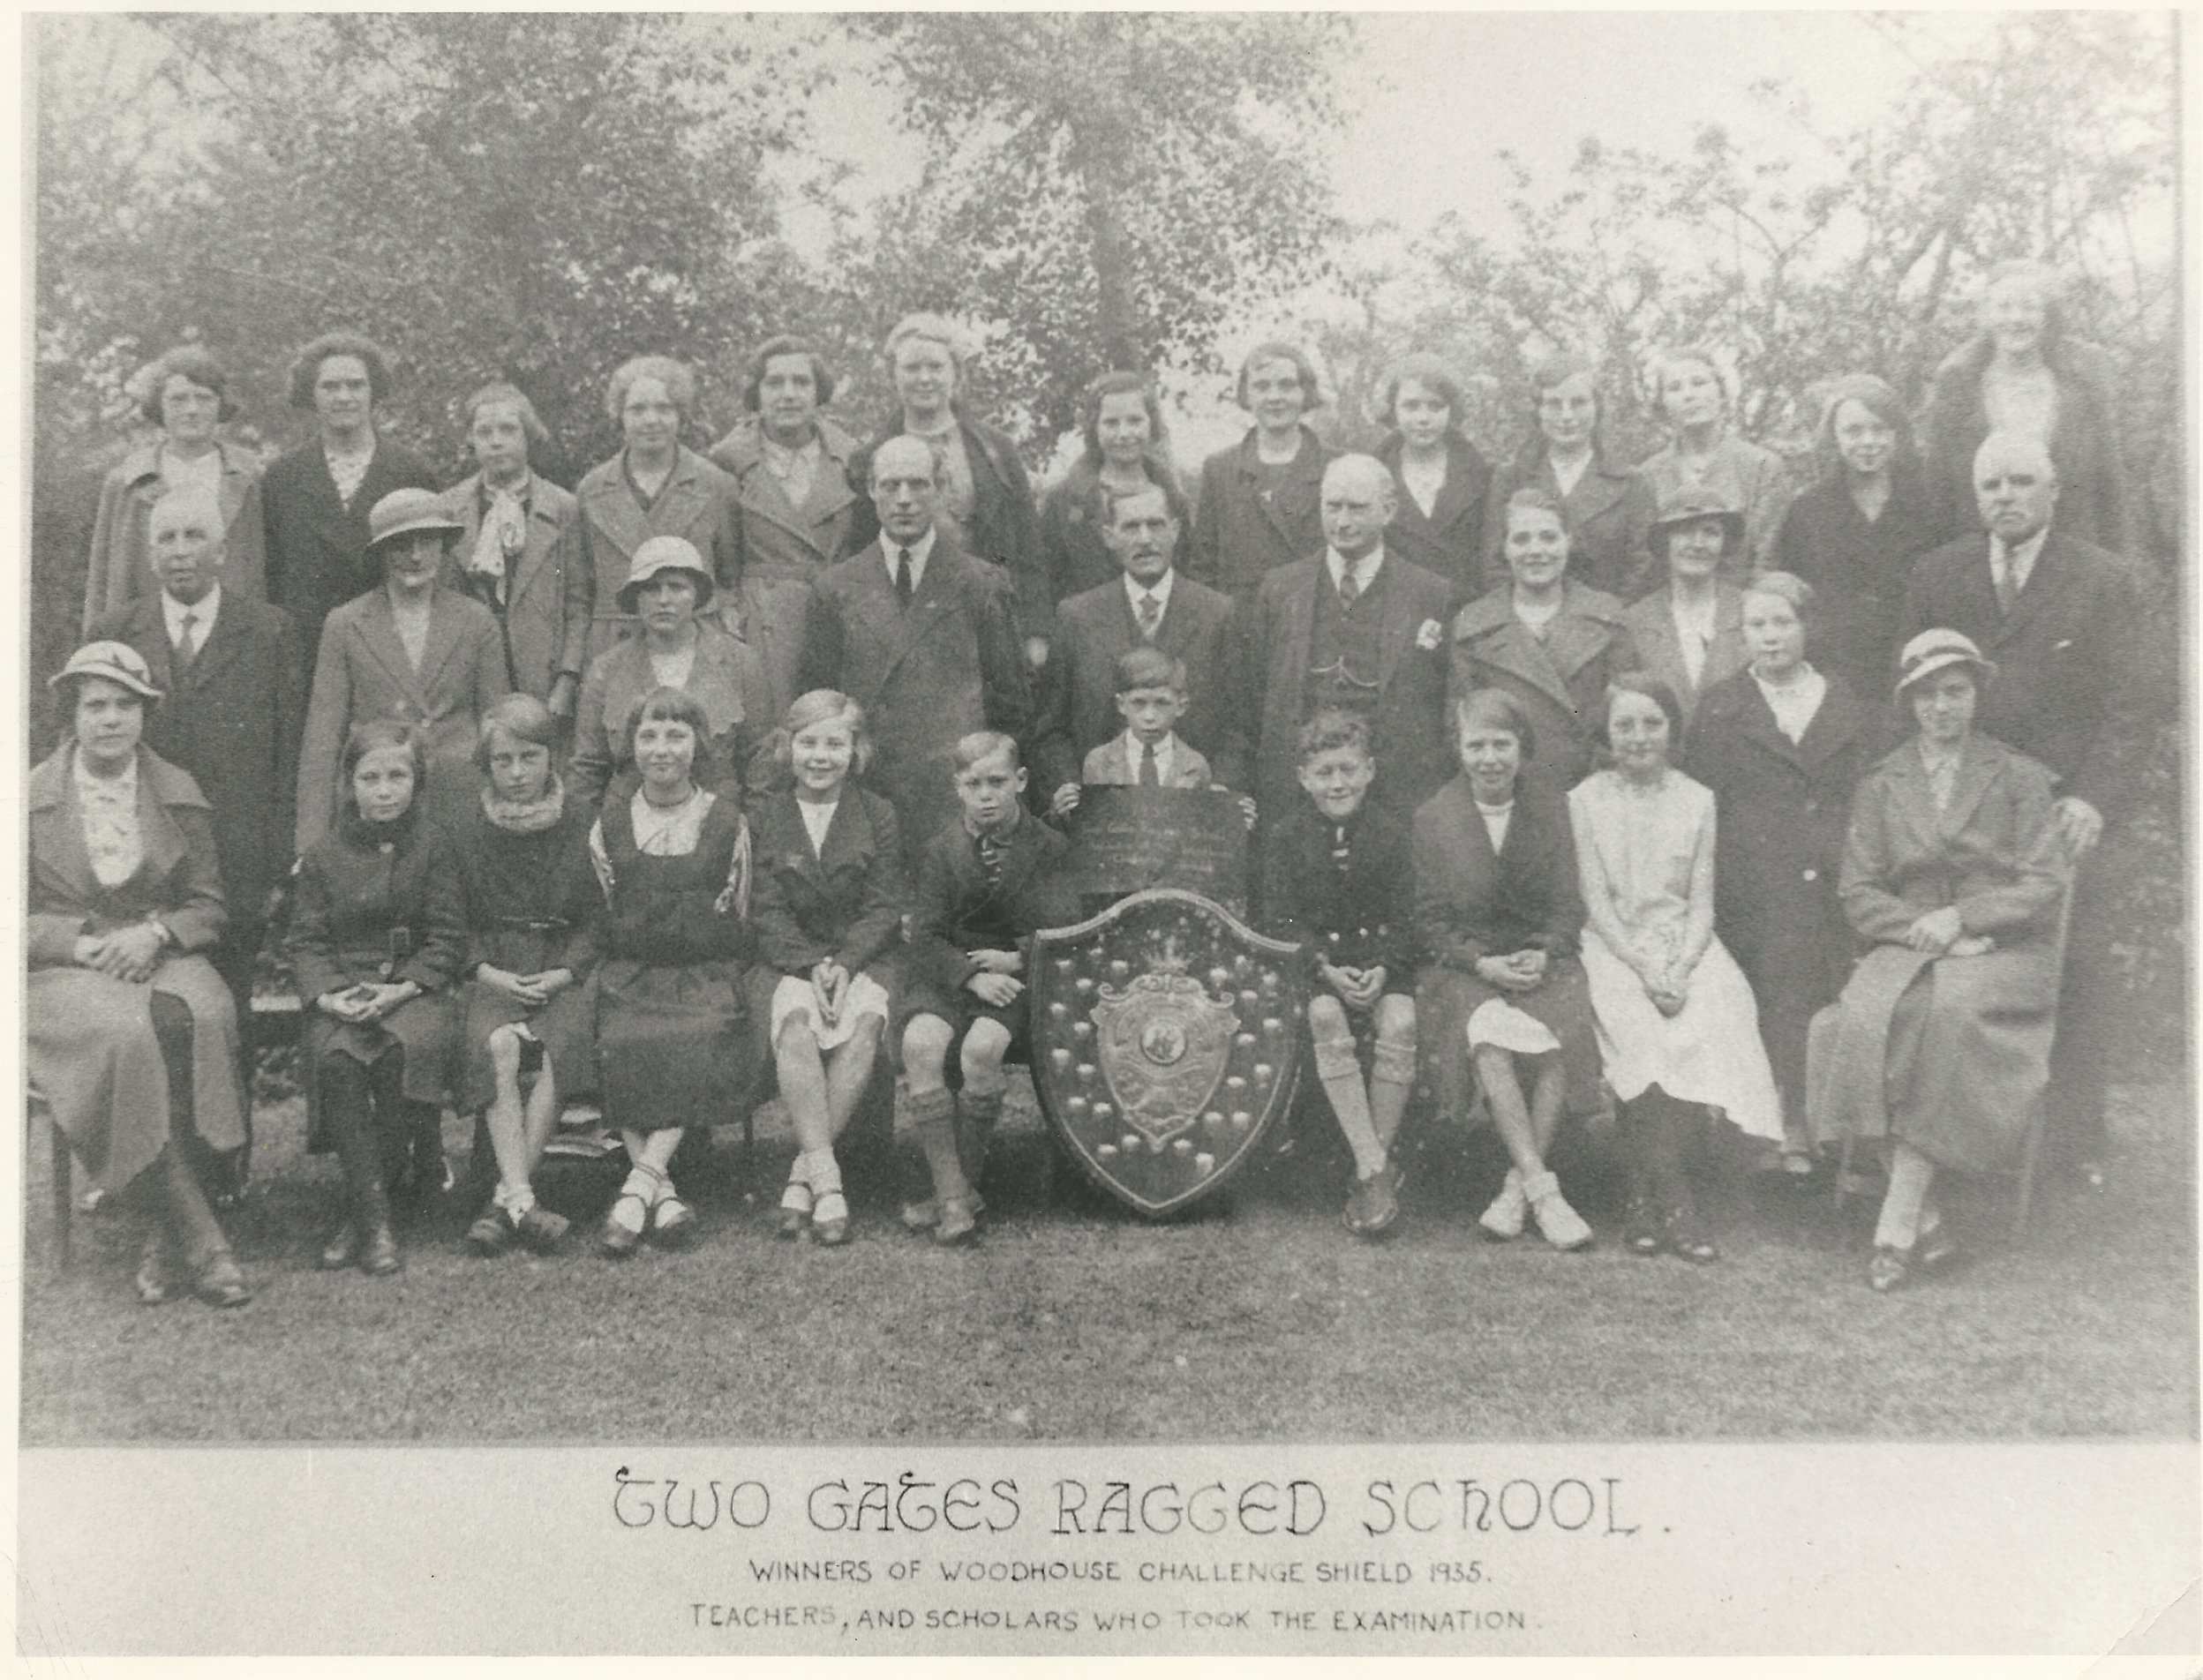 X007_1935_Woodhouse-Challenge winners